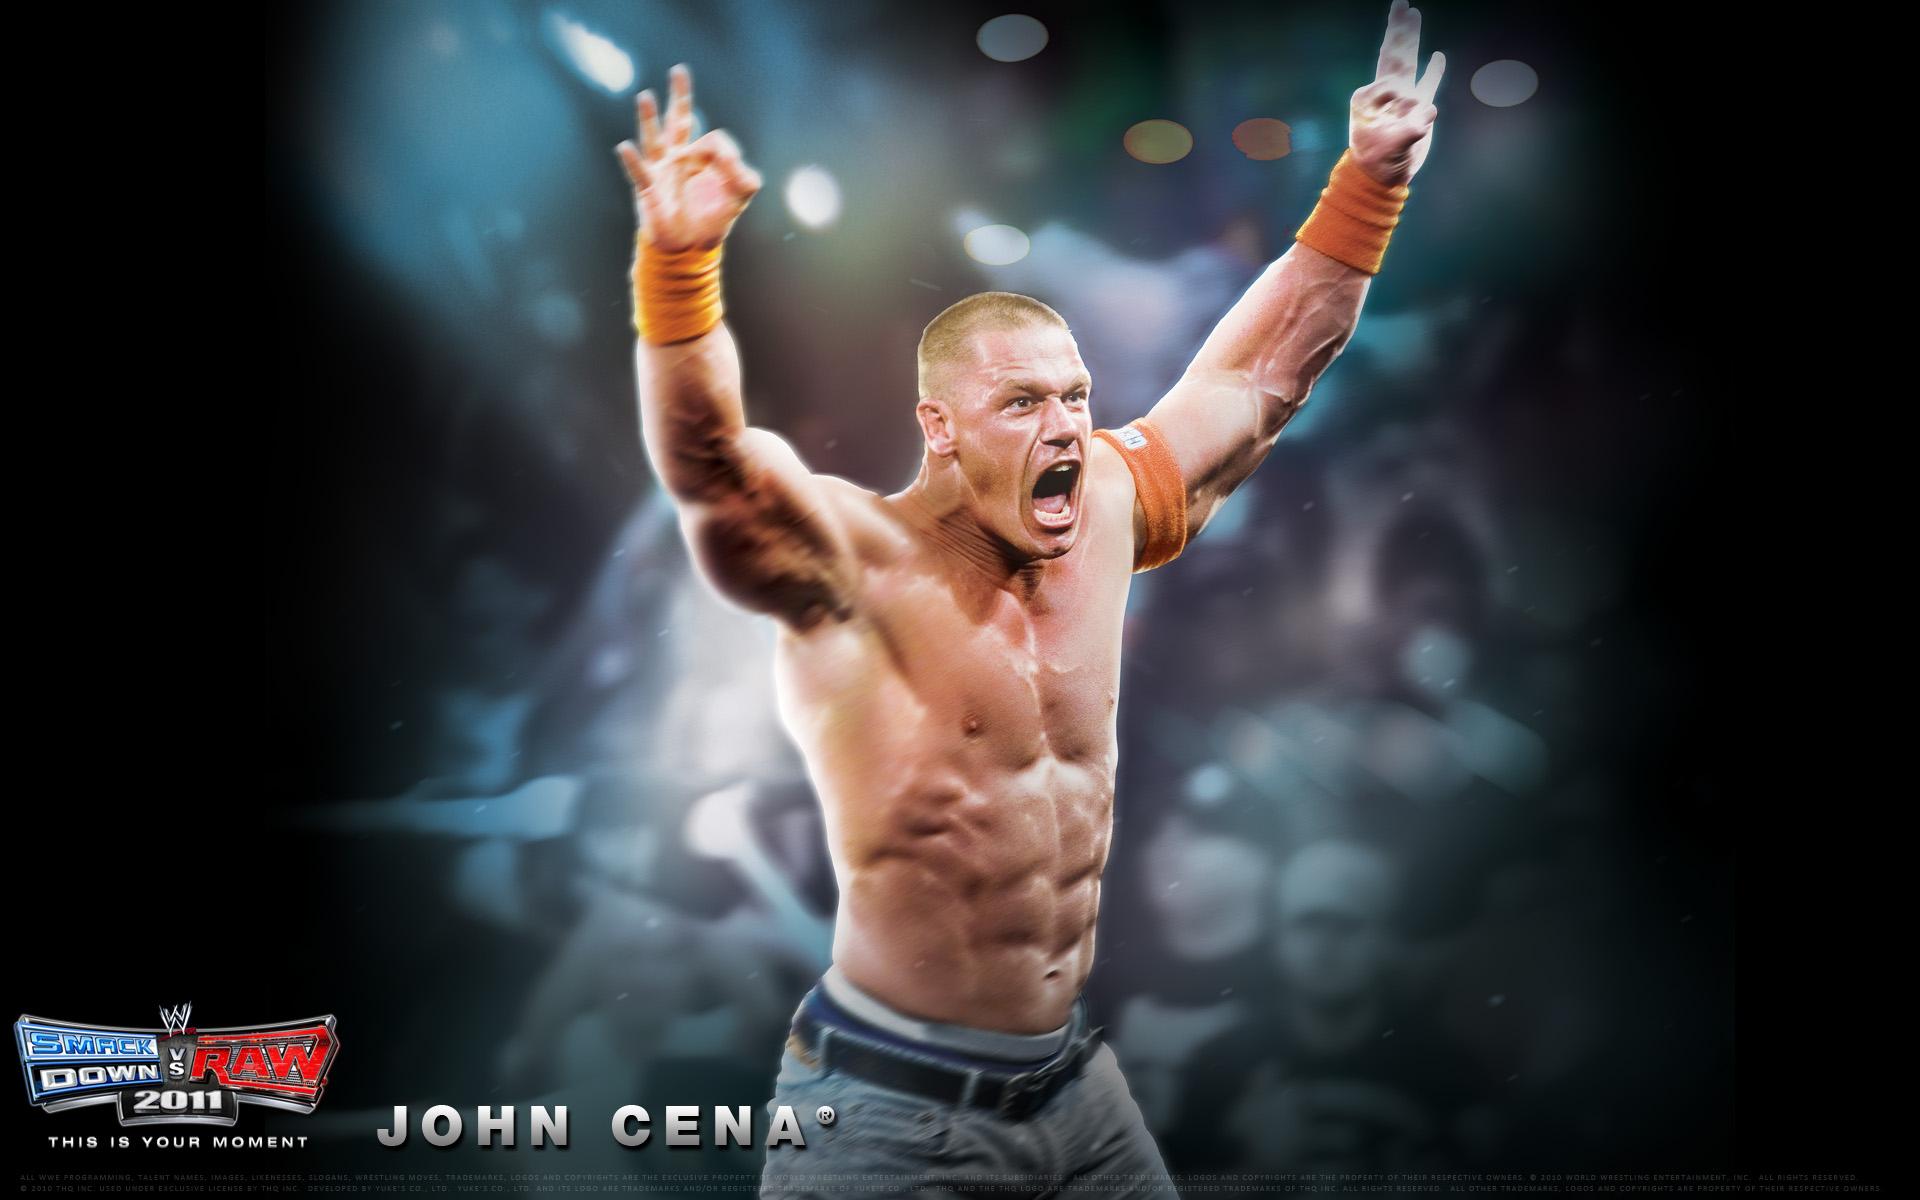 Wwe Smackdown Vs Raw 2011 John Cena Wallpaper